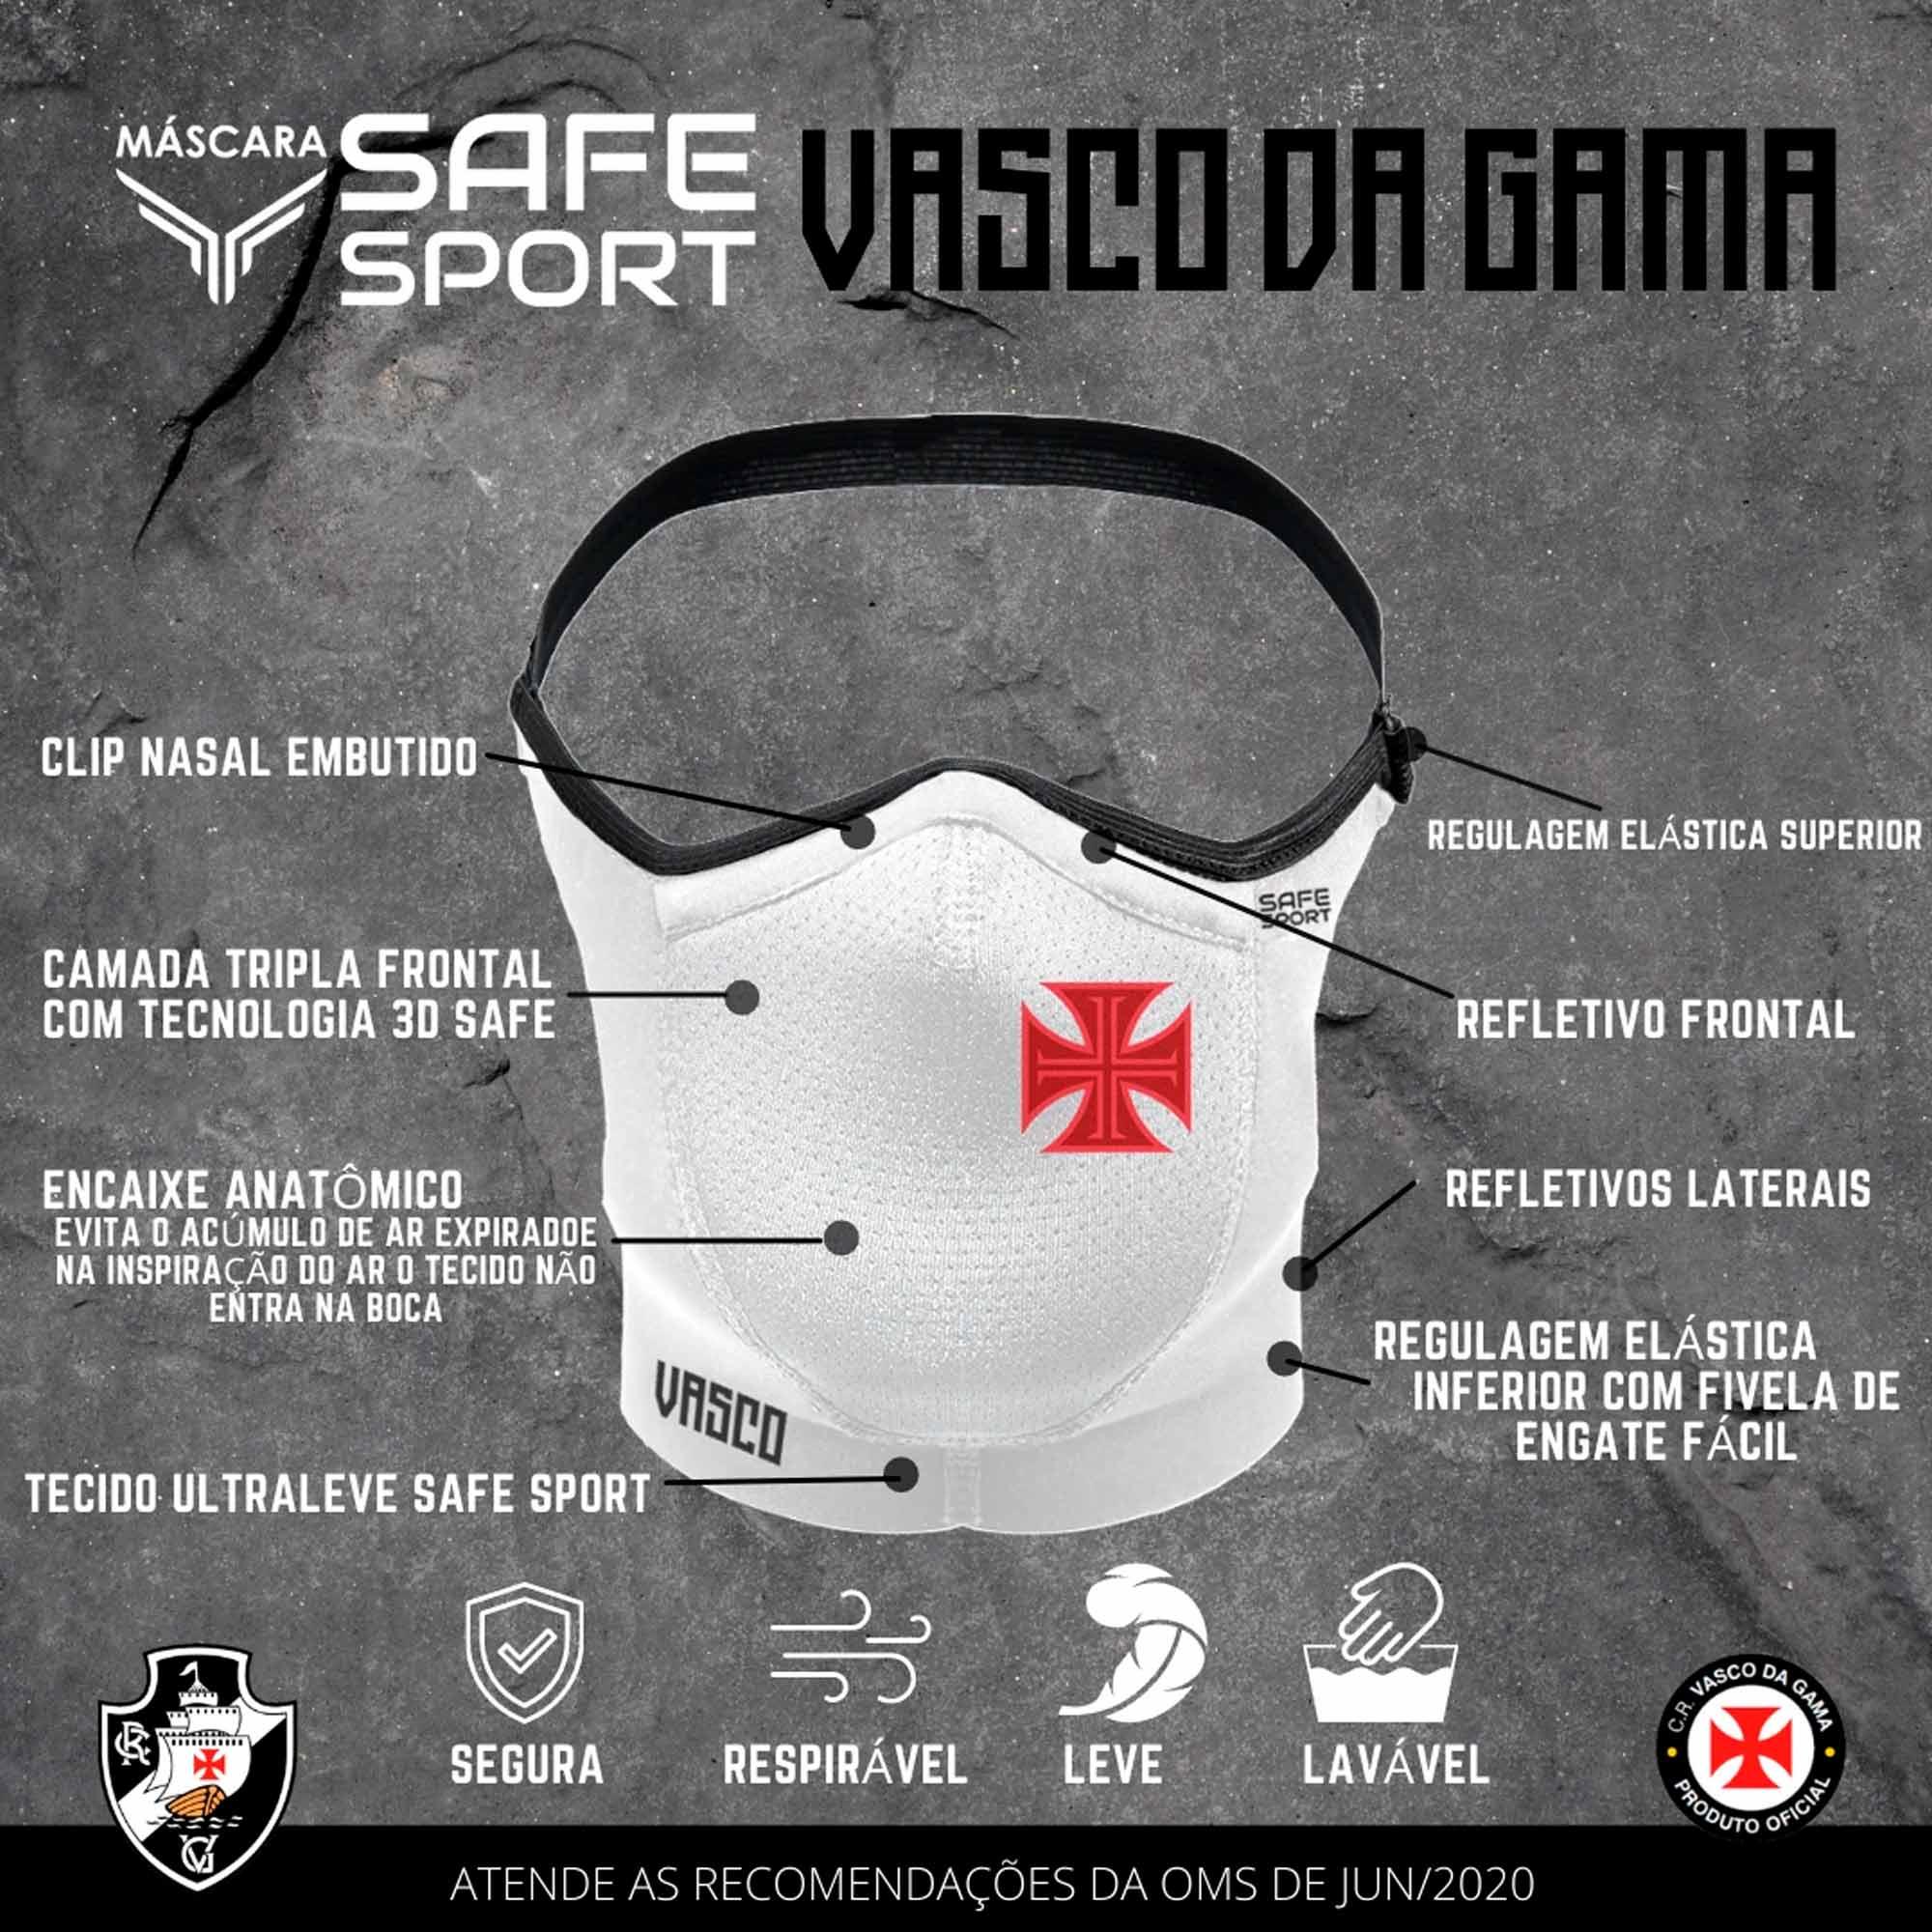 Mascara Safe Sport do Vasco Branca